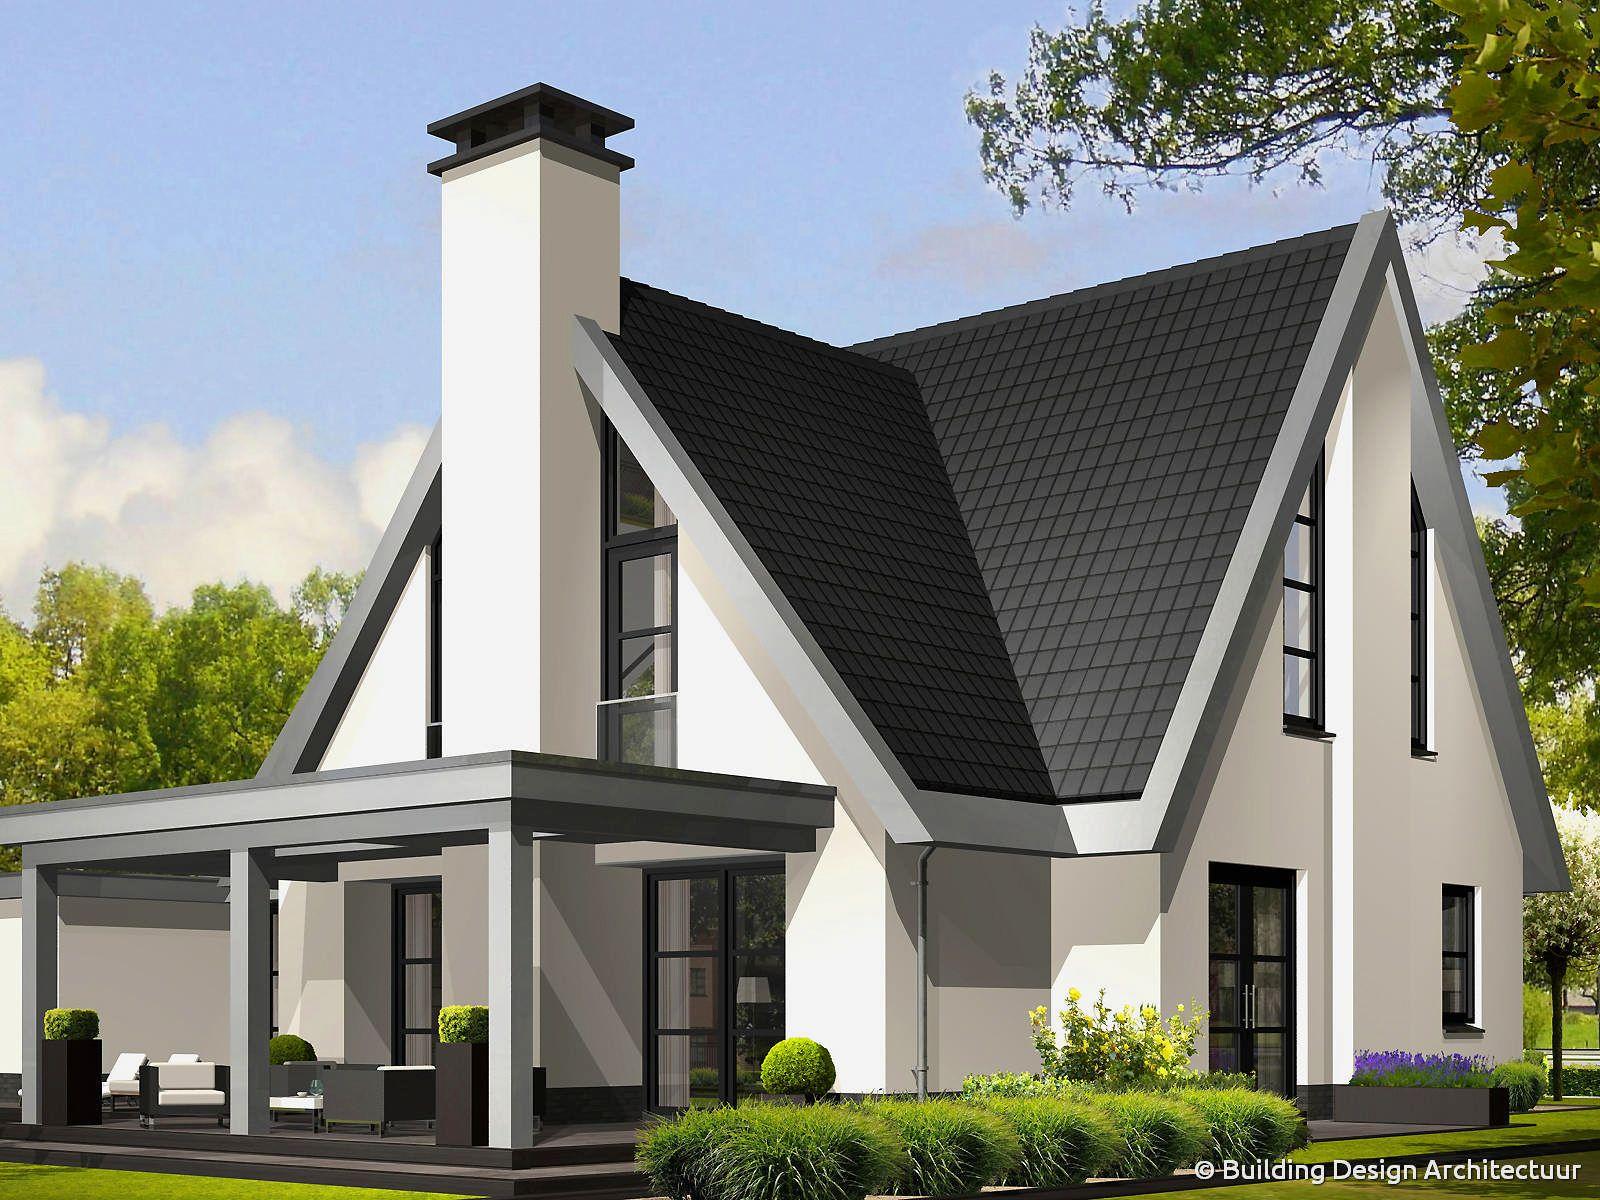 Veranda zinken dakrand houses garden pinterest for Huizen architectuur